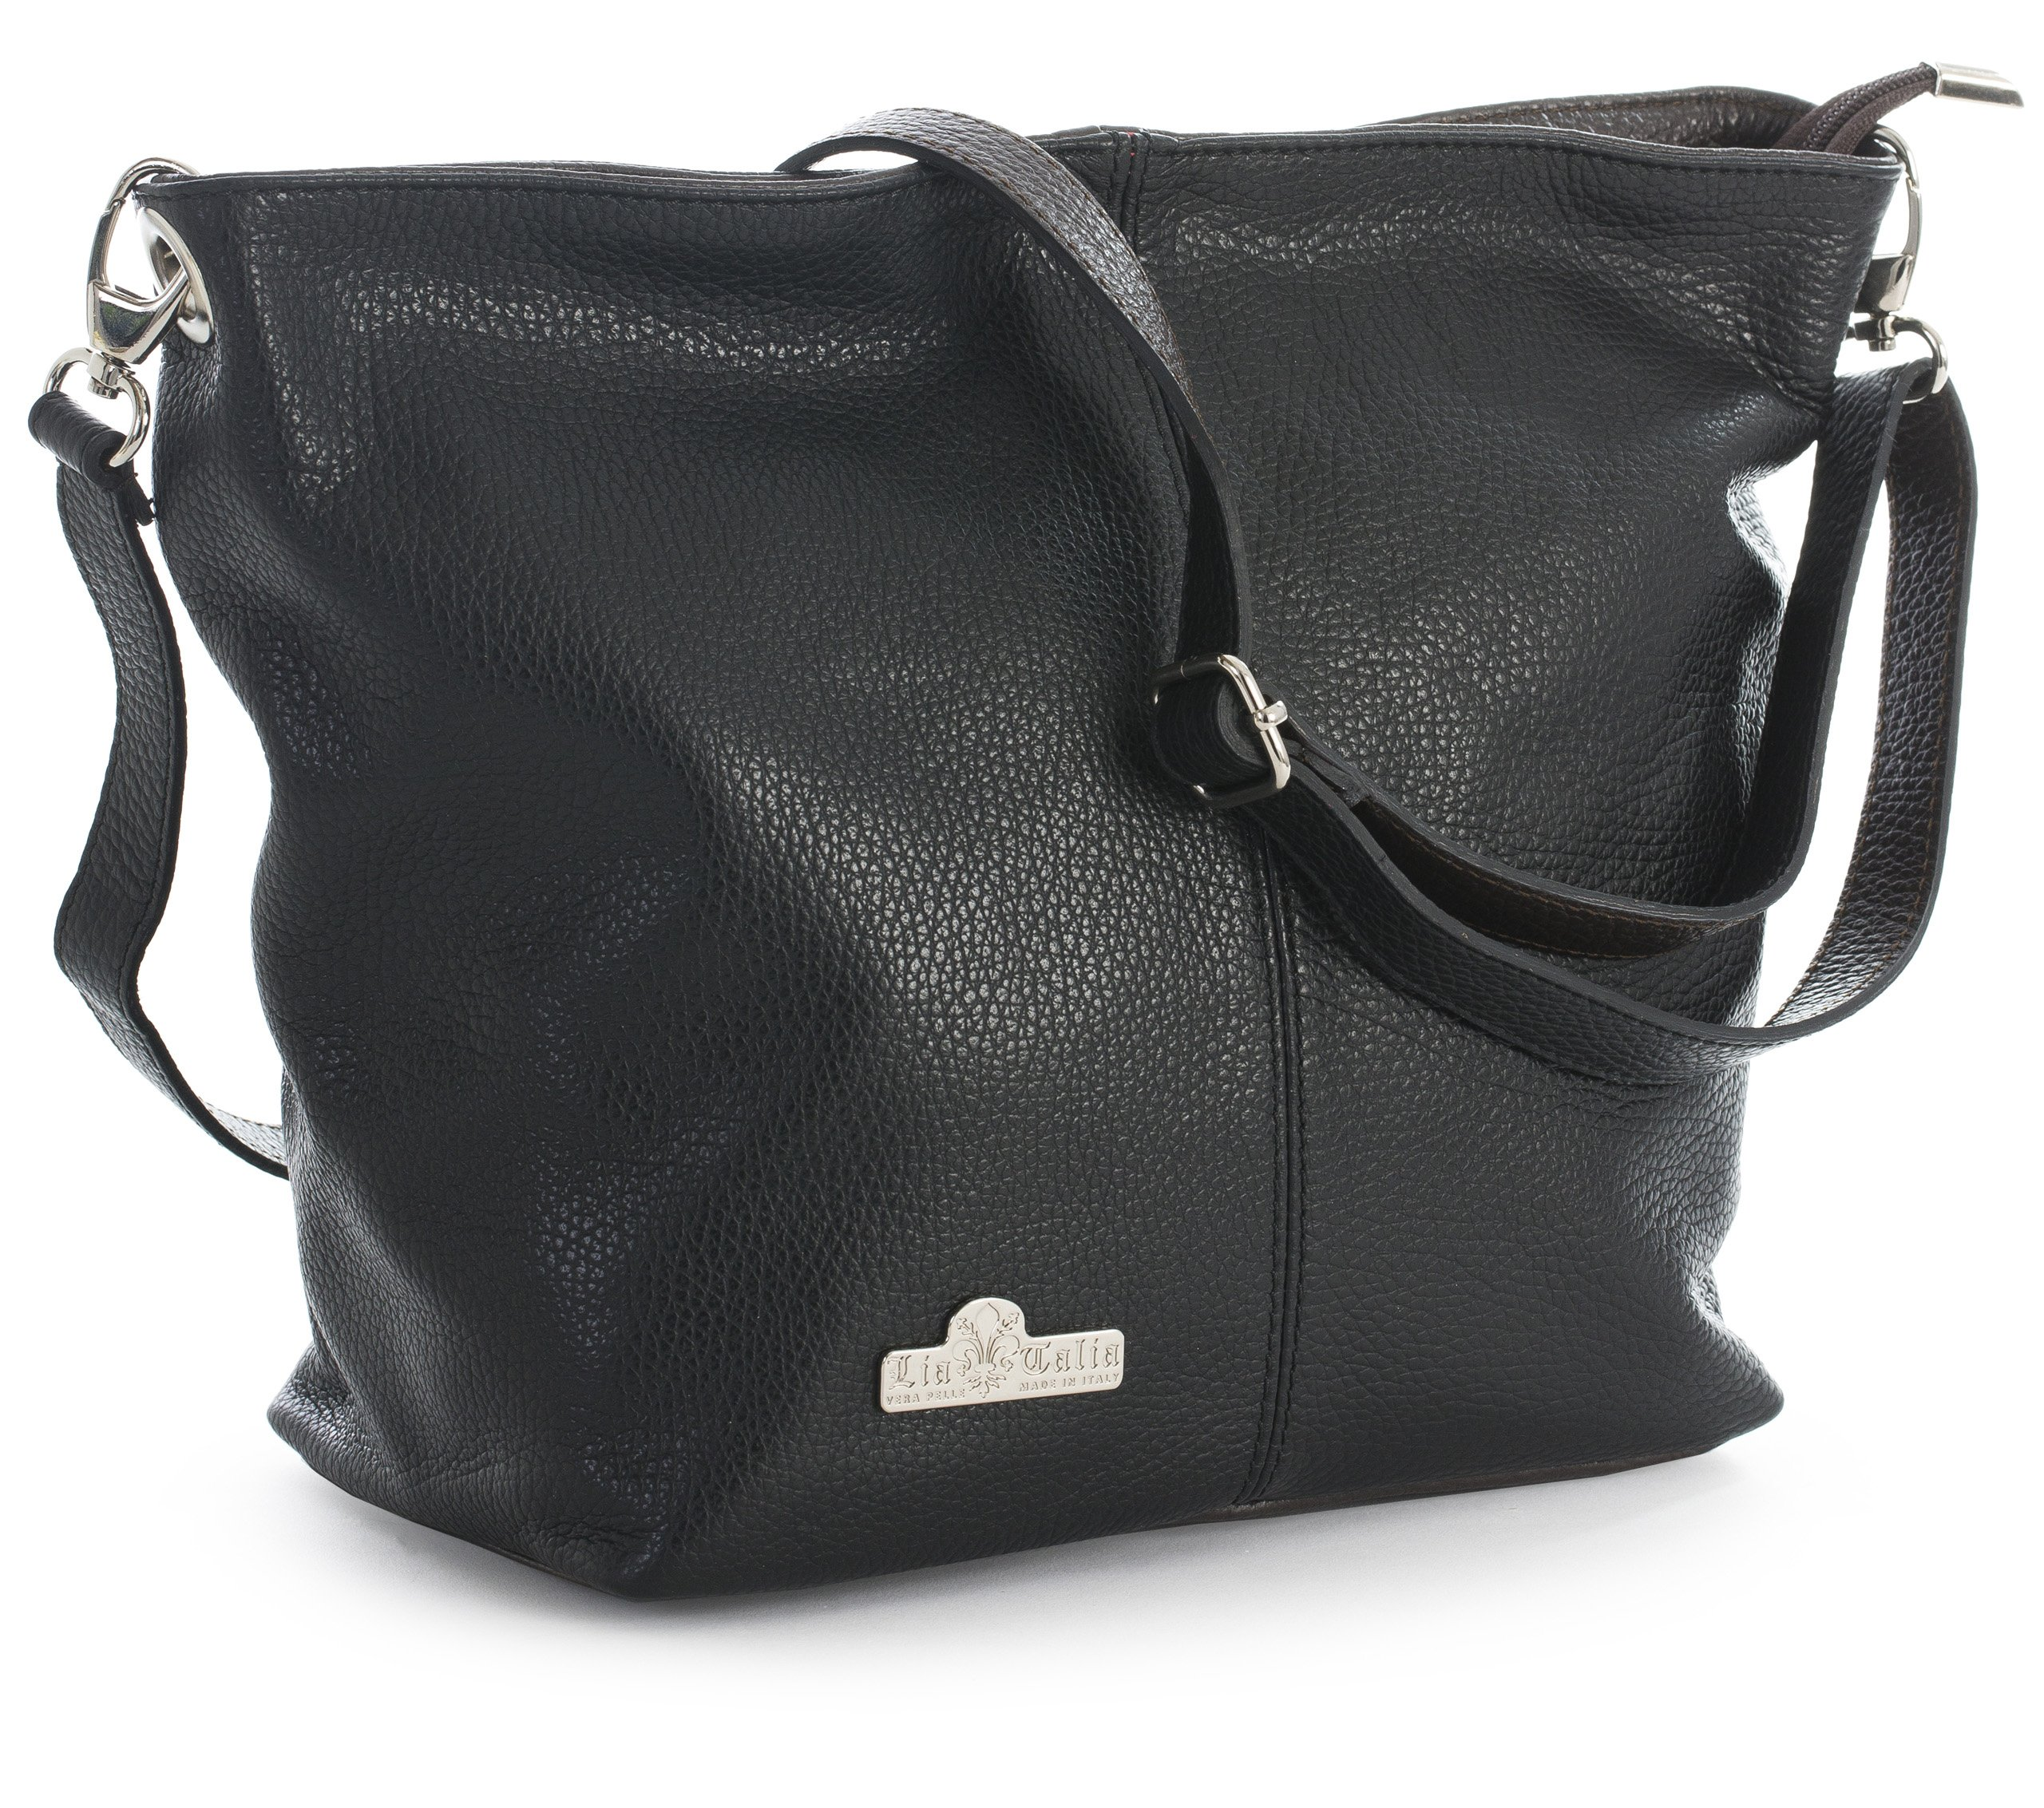 LiaTalia Womens Genuine Italian Leather Medium Hobo Shoulder Bag with Protective Storage Bag - Adal [Black & Coffee Trim]